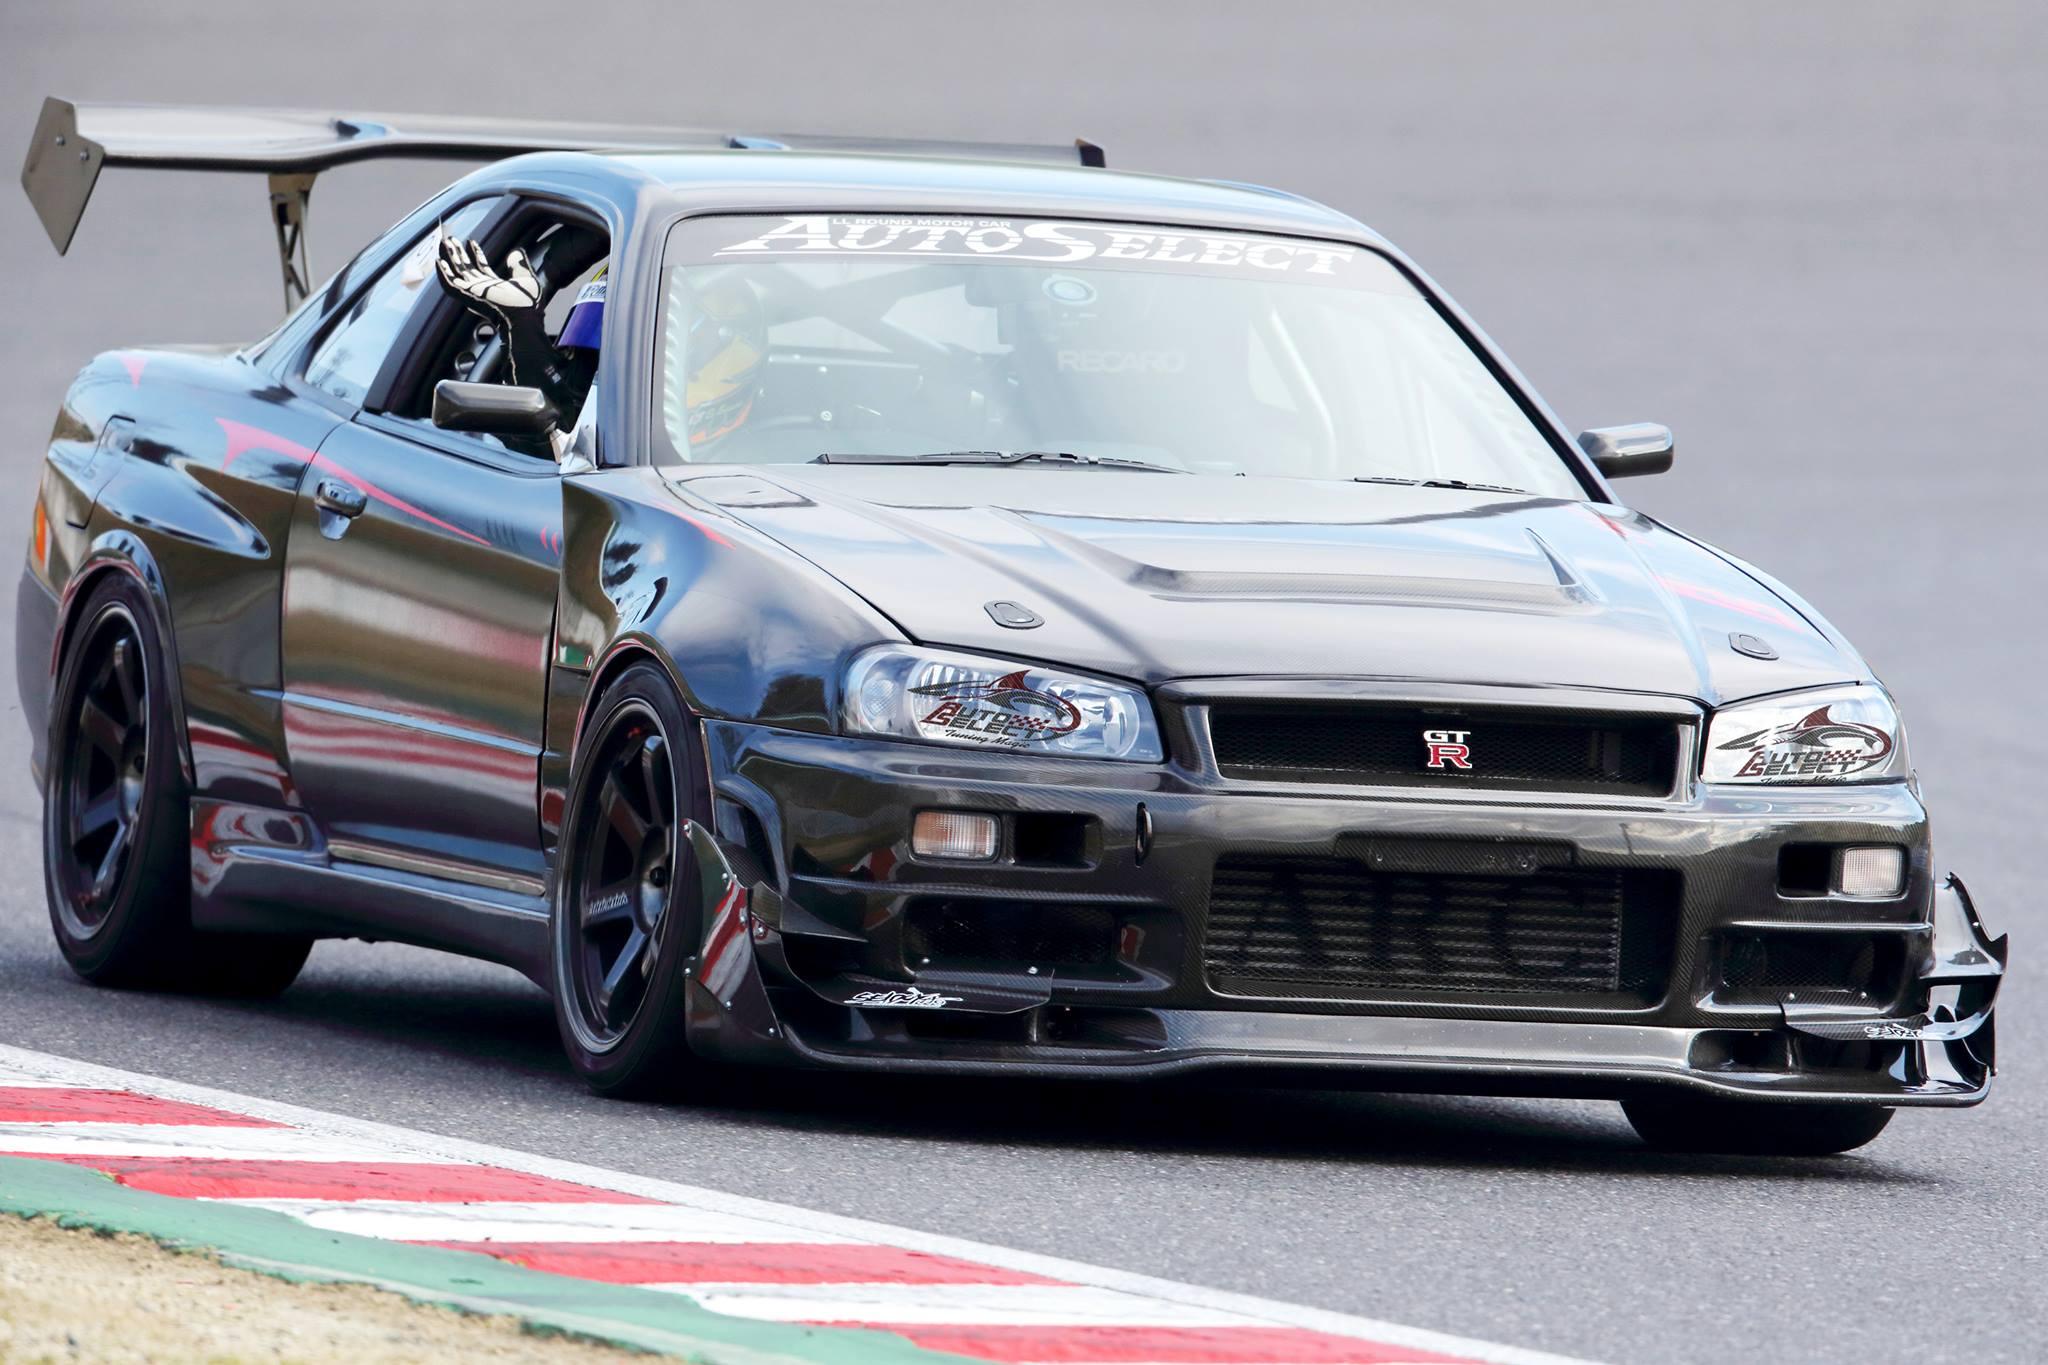 Autoselect GTR